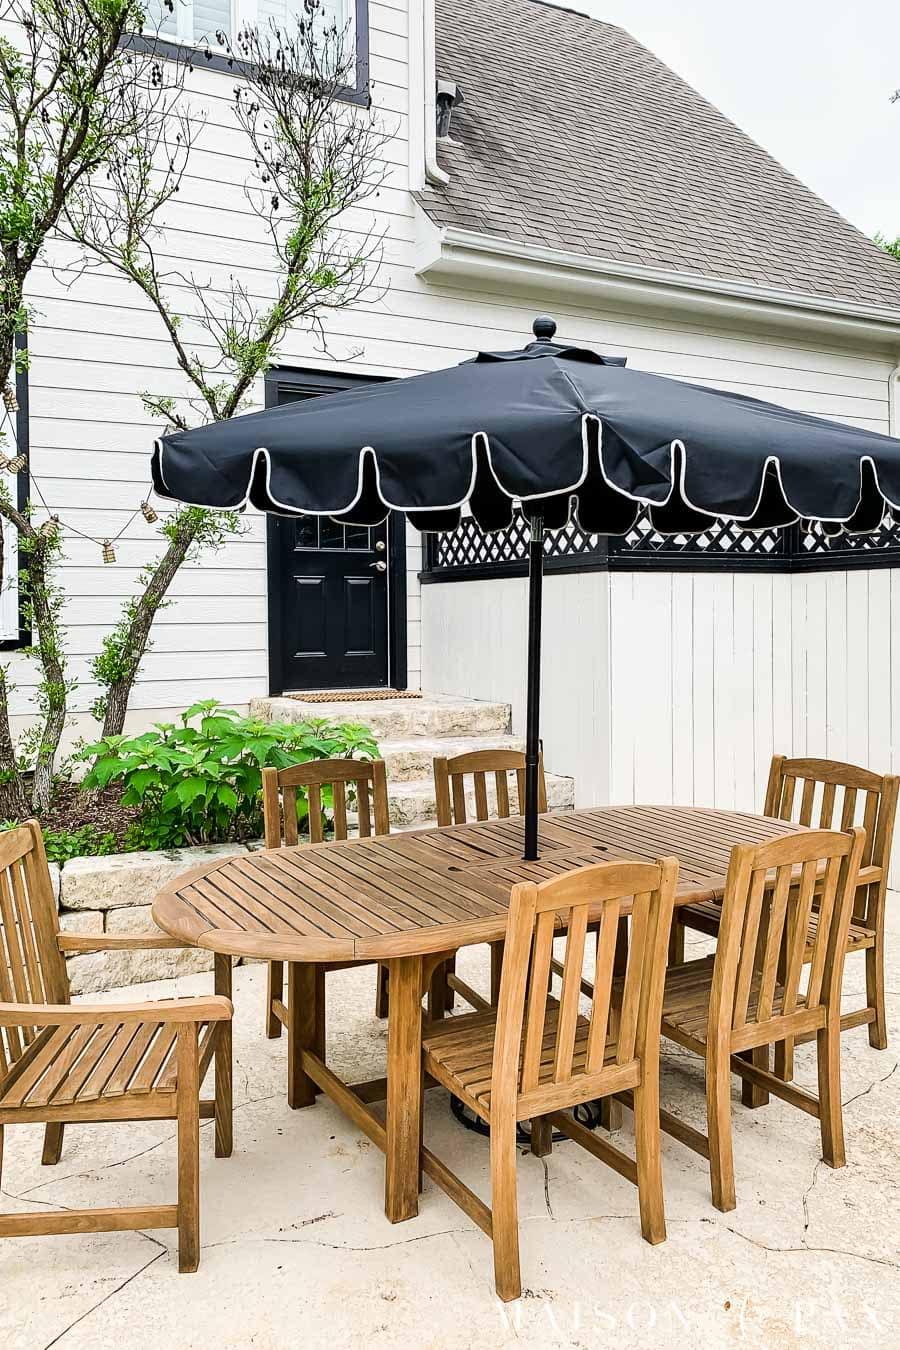 golden teak outdoor dining set with black umbrella